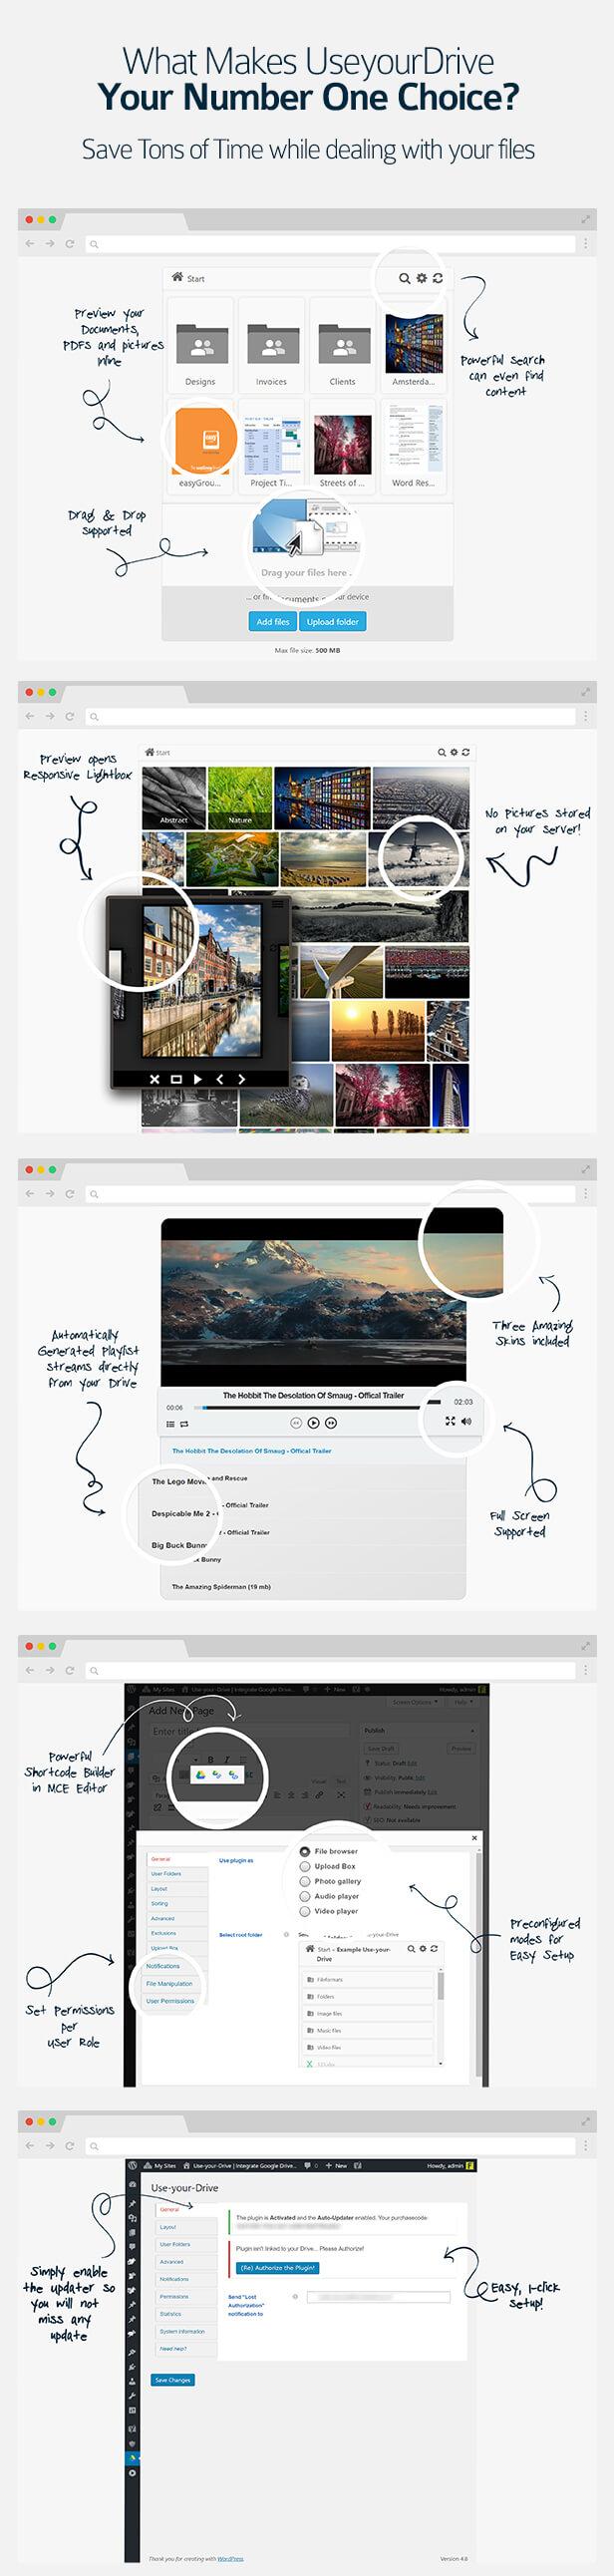 useyourdrive5 - Use-your-Drive | Google Drive plugin for WordPress